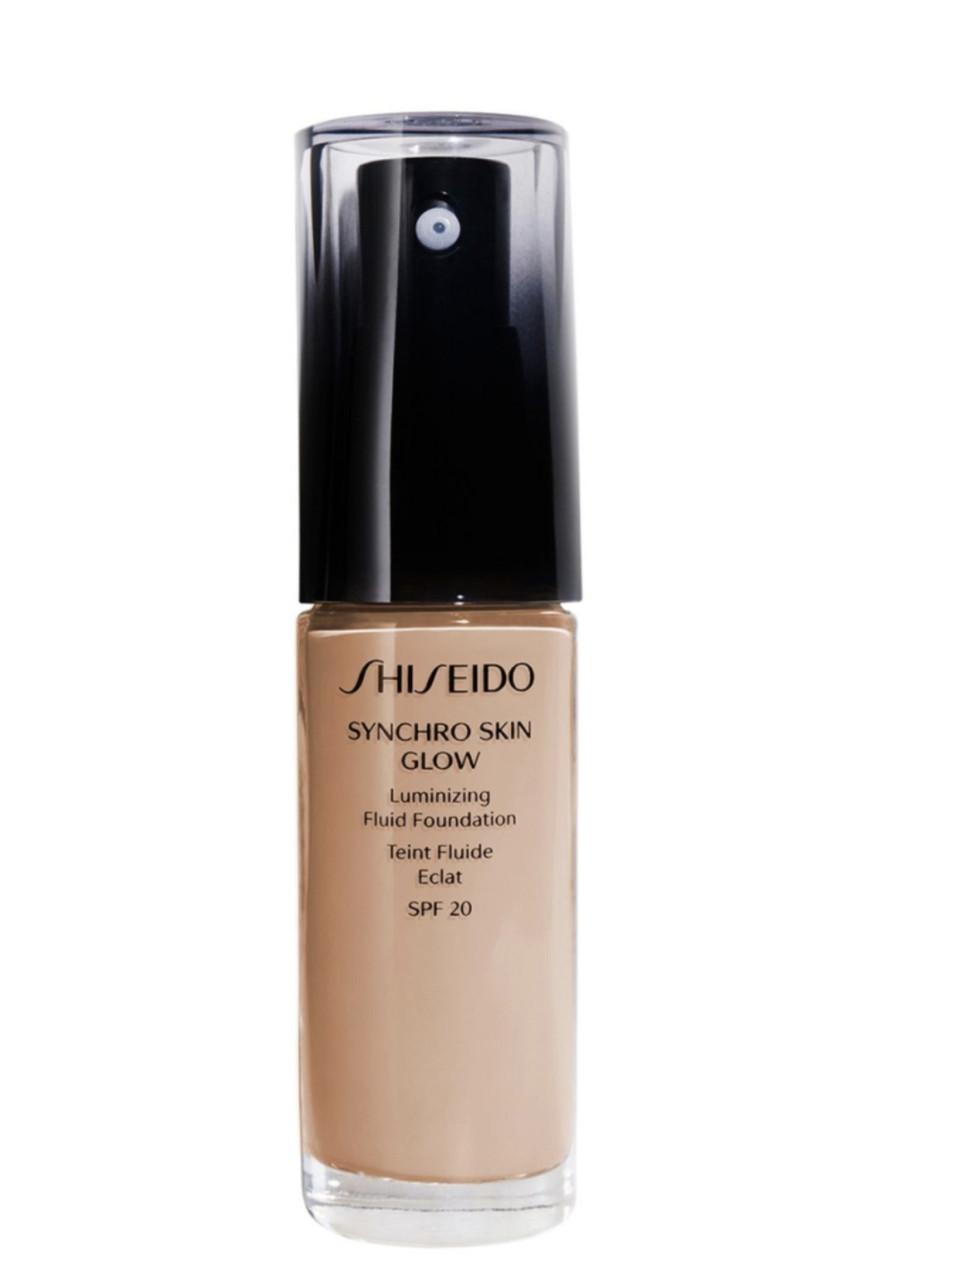 Тональная основа Shiseido Synchro Skin Glow Luminizing Fluid Foundation SPF 20 - N2 Neutral